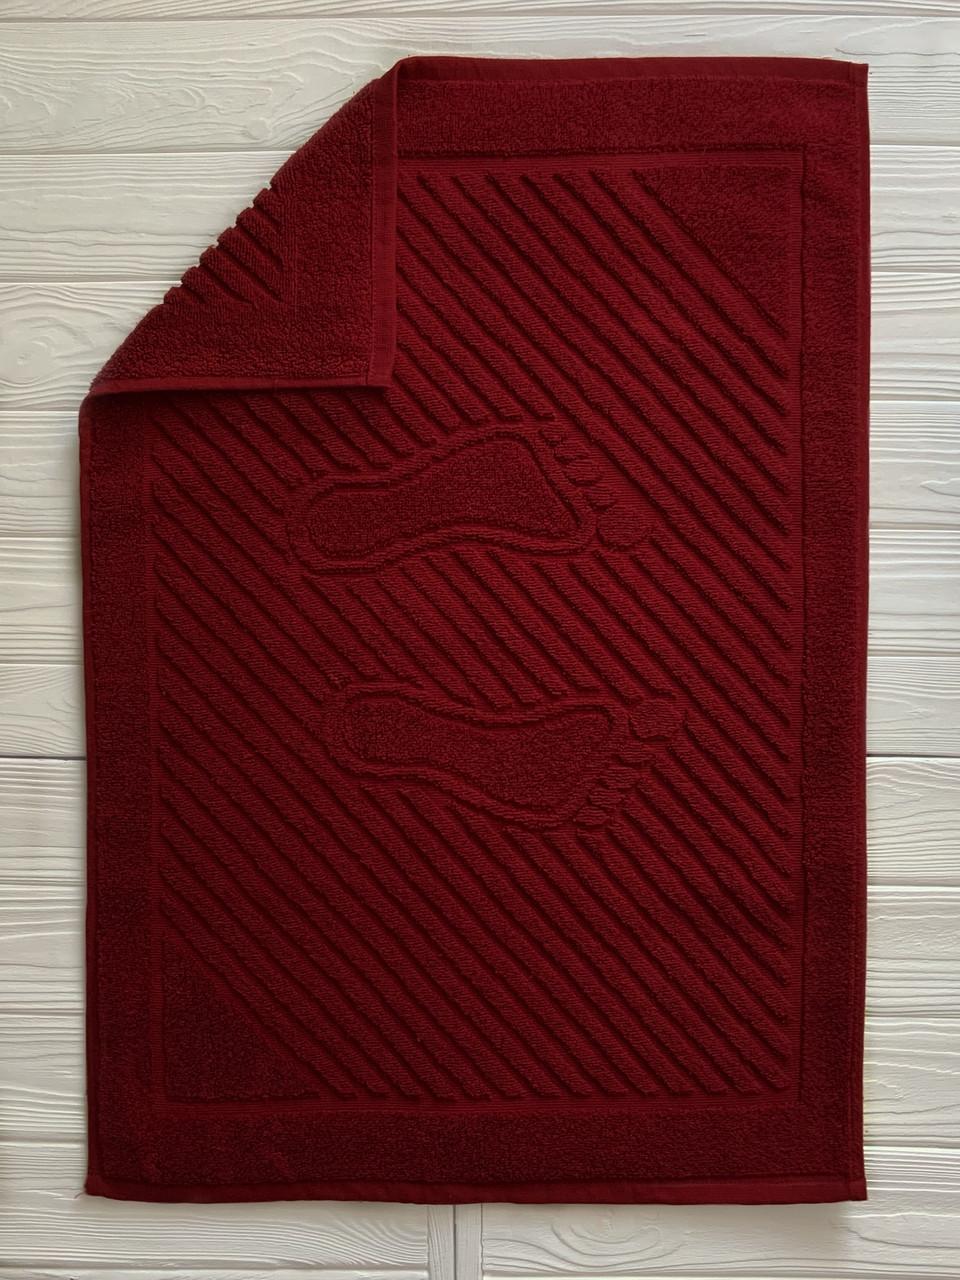 Махровое полотенце для ног, Туркменистан, 700 гр\м2, рубиновый 50 x 70см